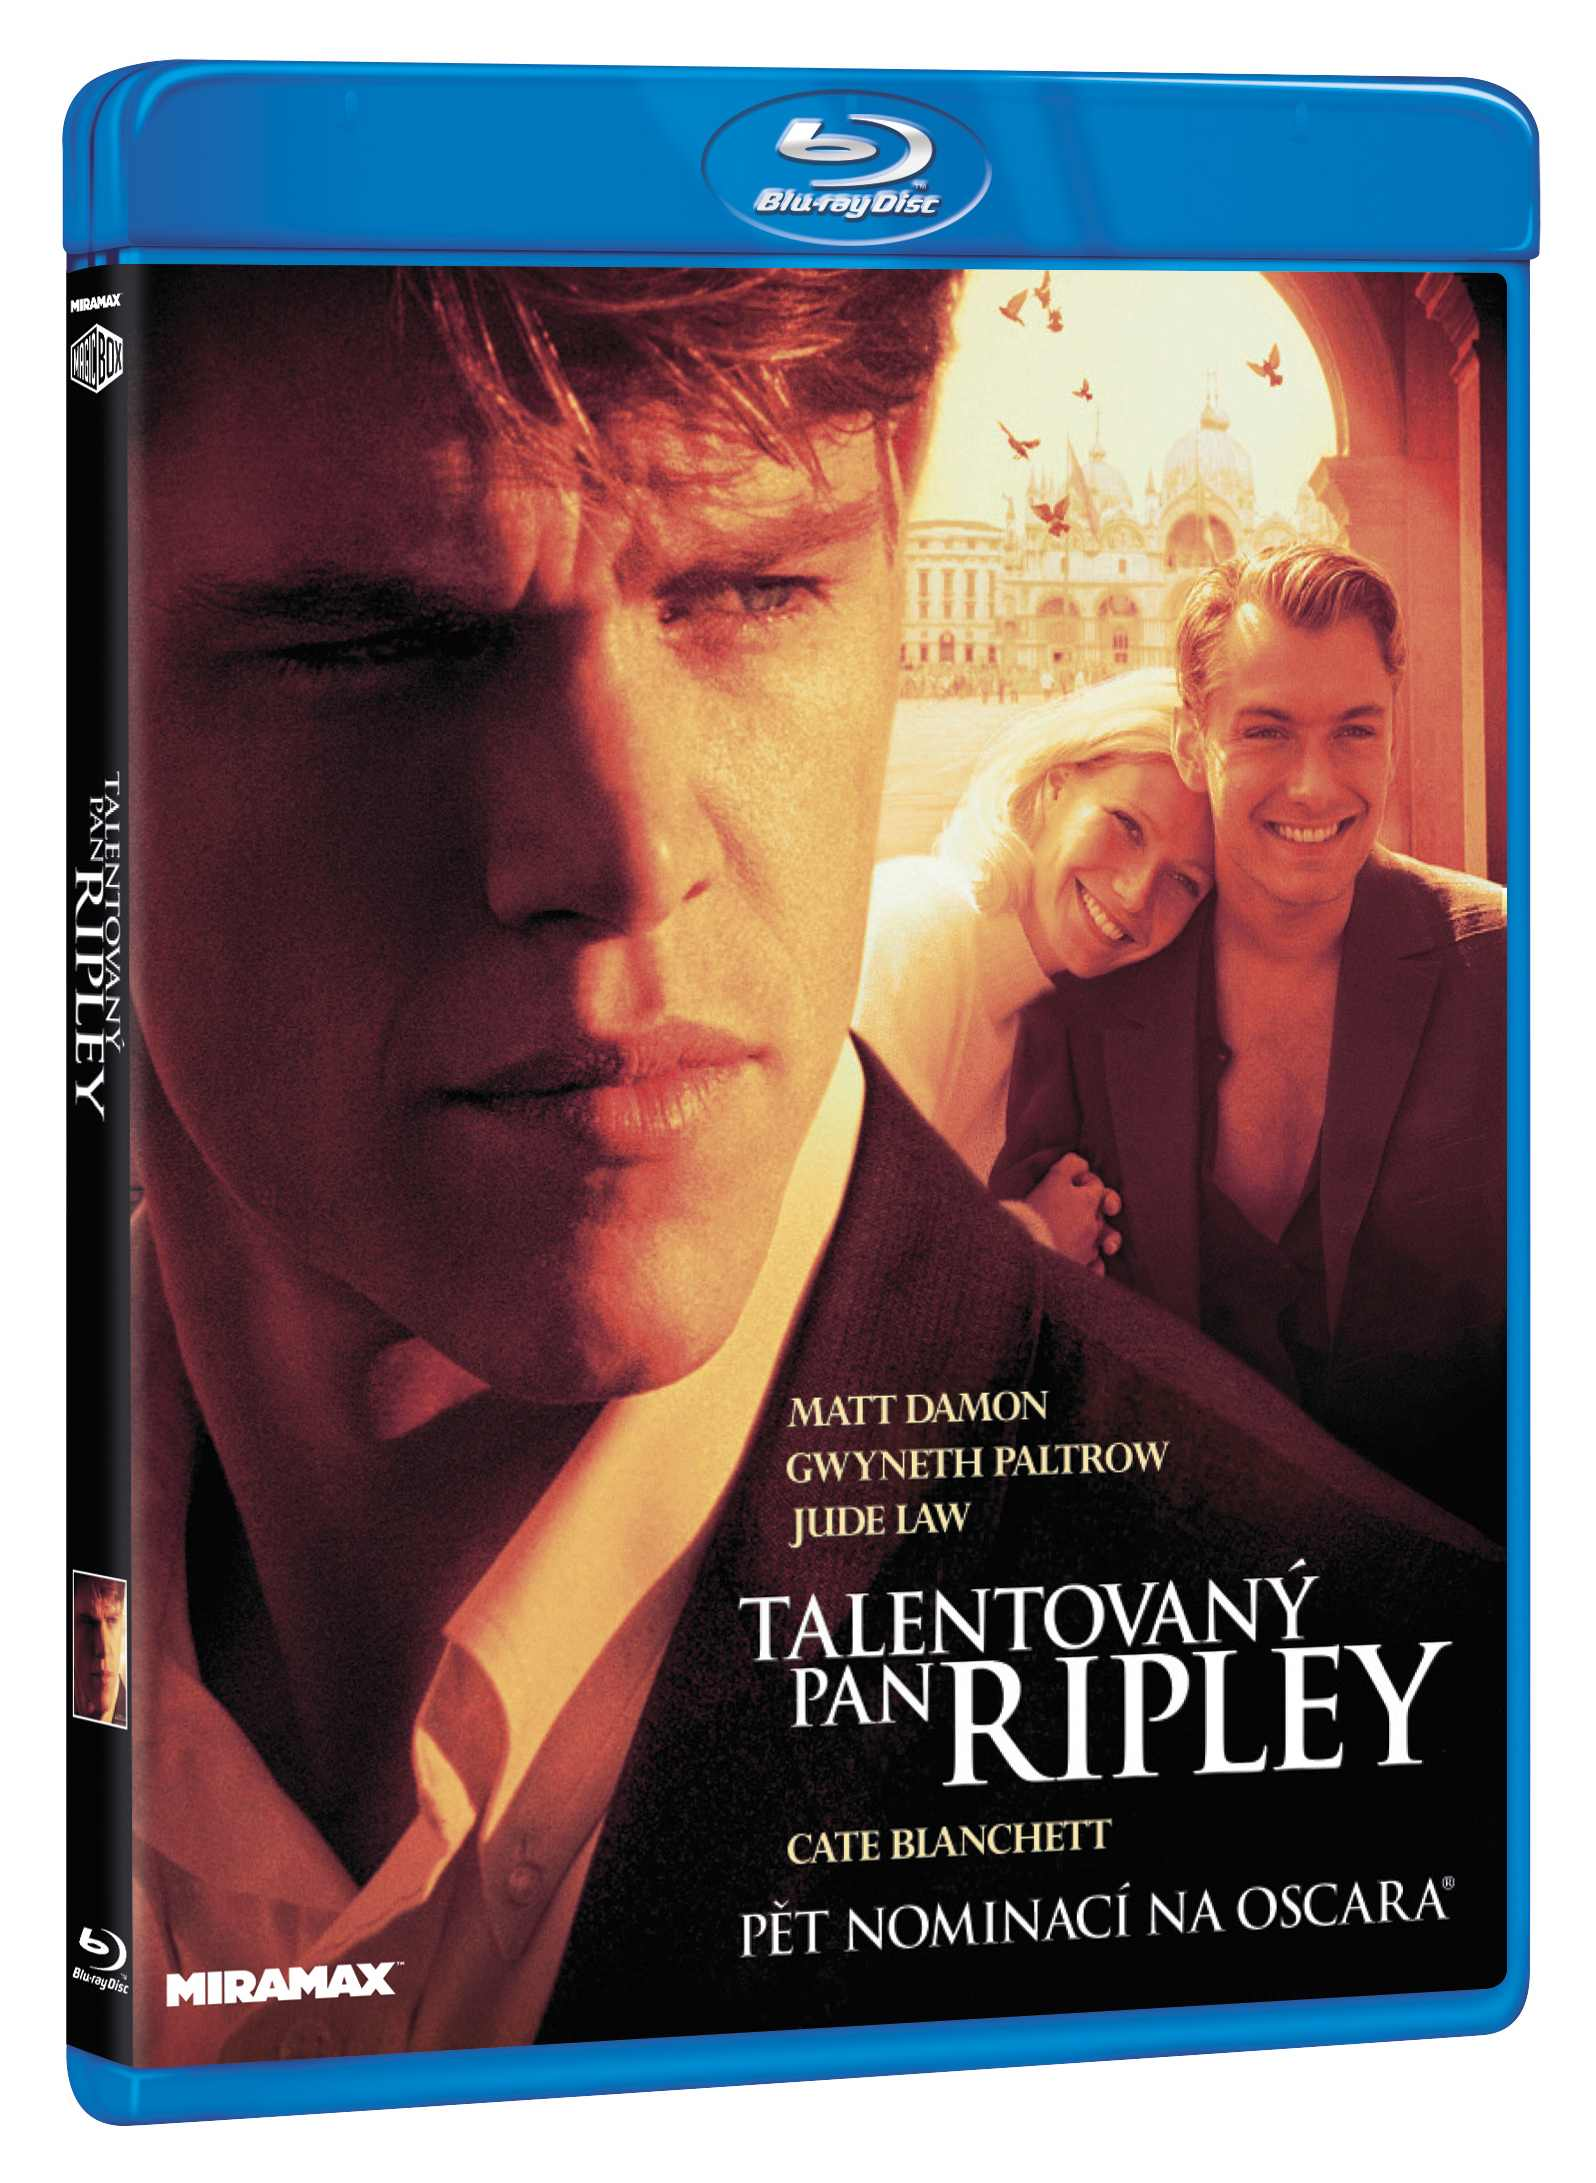 TALENTOVANÝ PAN RIPLEY - Blu-ray